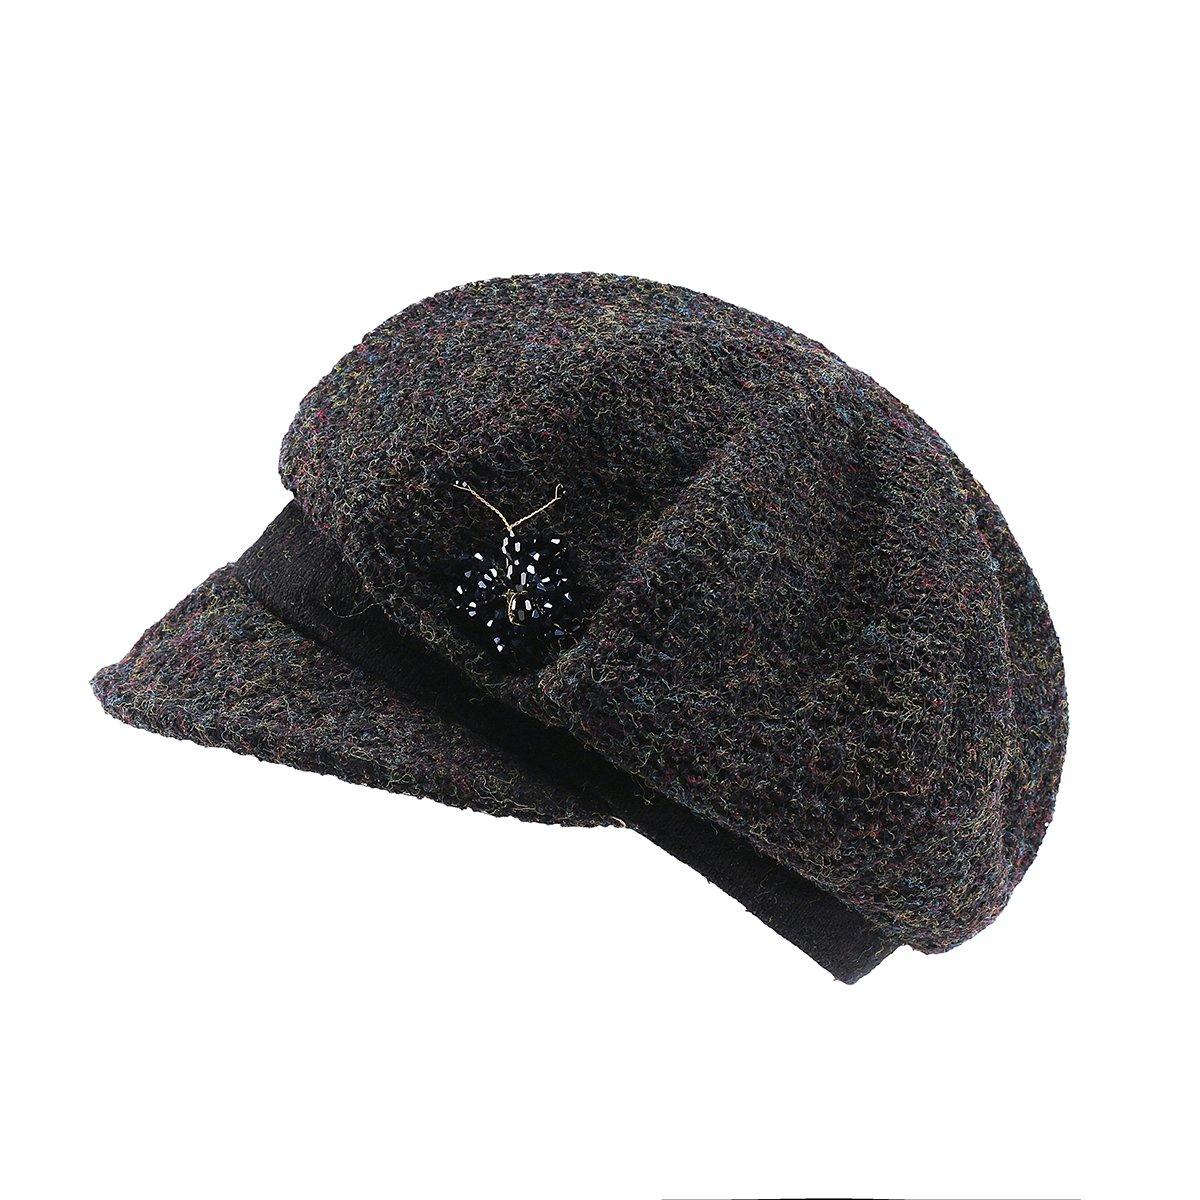 12bab749a0b51 Amazon.com  JOOWEN Knitted Textured Crochet Slouchy Newsboy Cap Cabbie Beret  Visor Bill Hat (Black)  Clothing